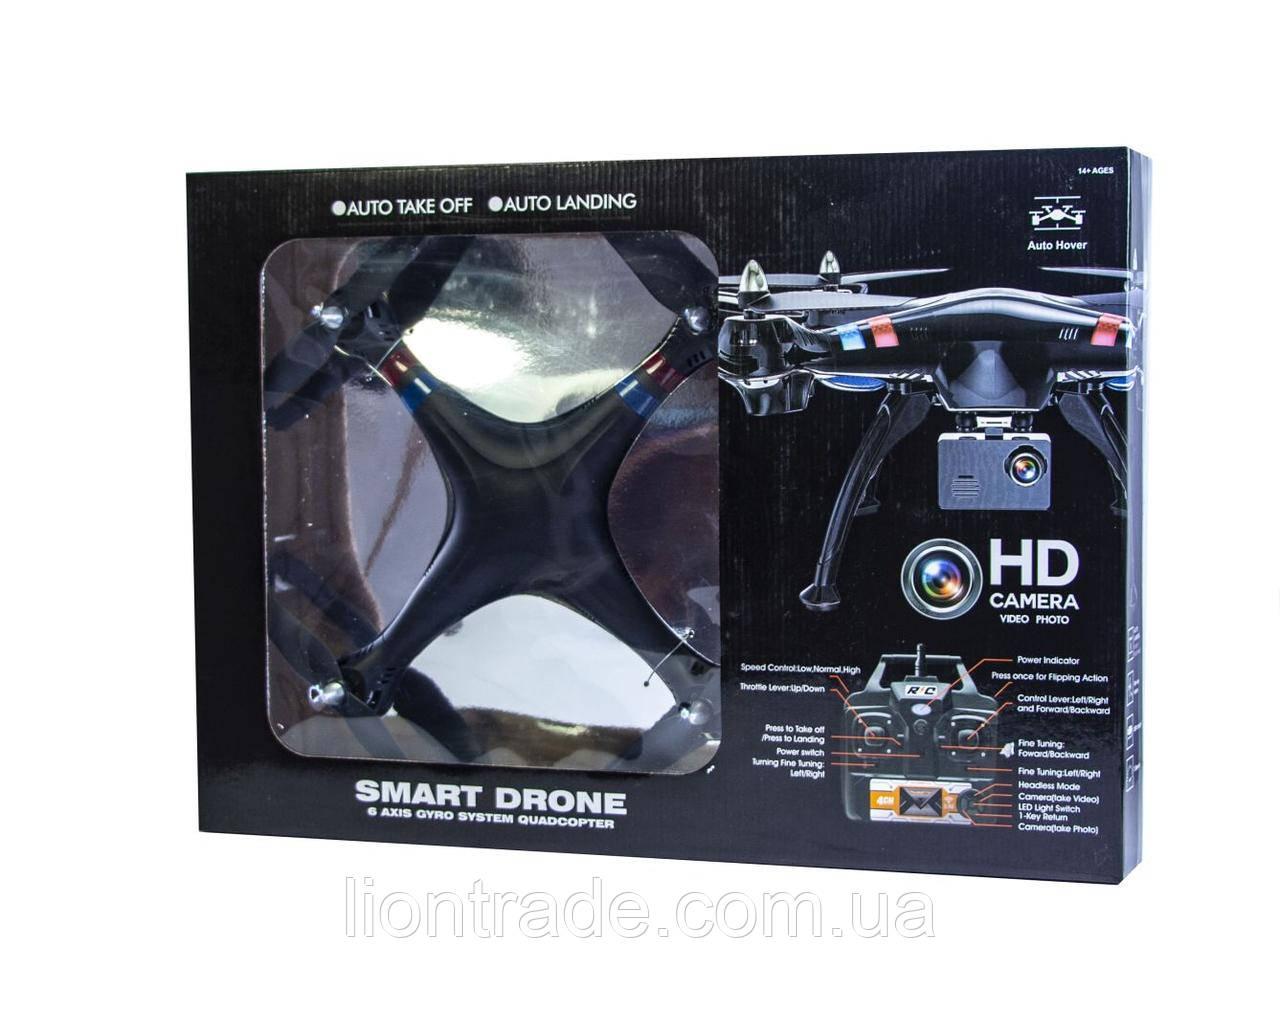 Квадрокоптер Smart Drone 2098 оптом